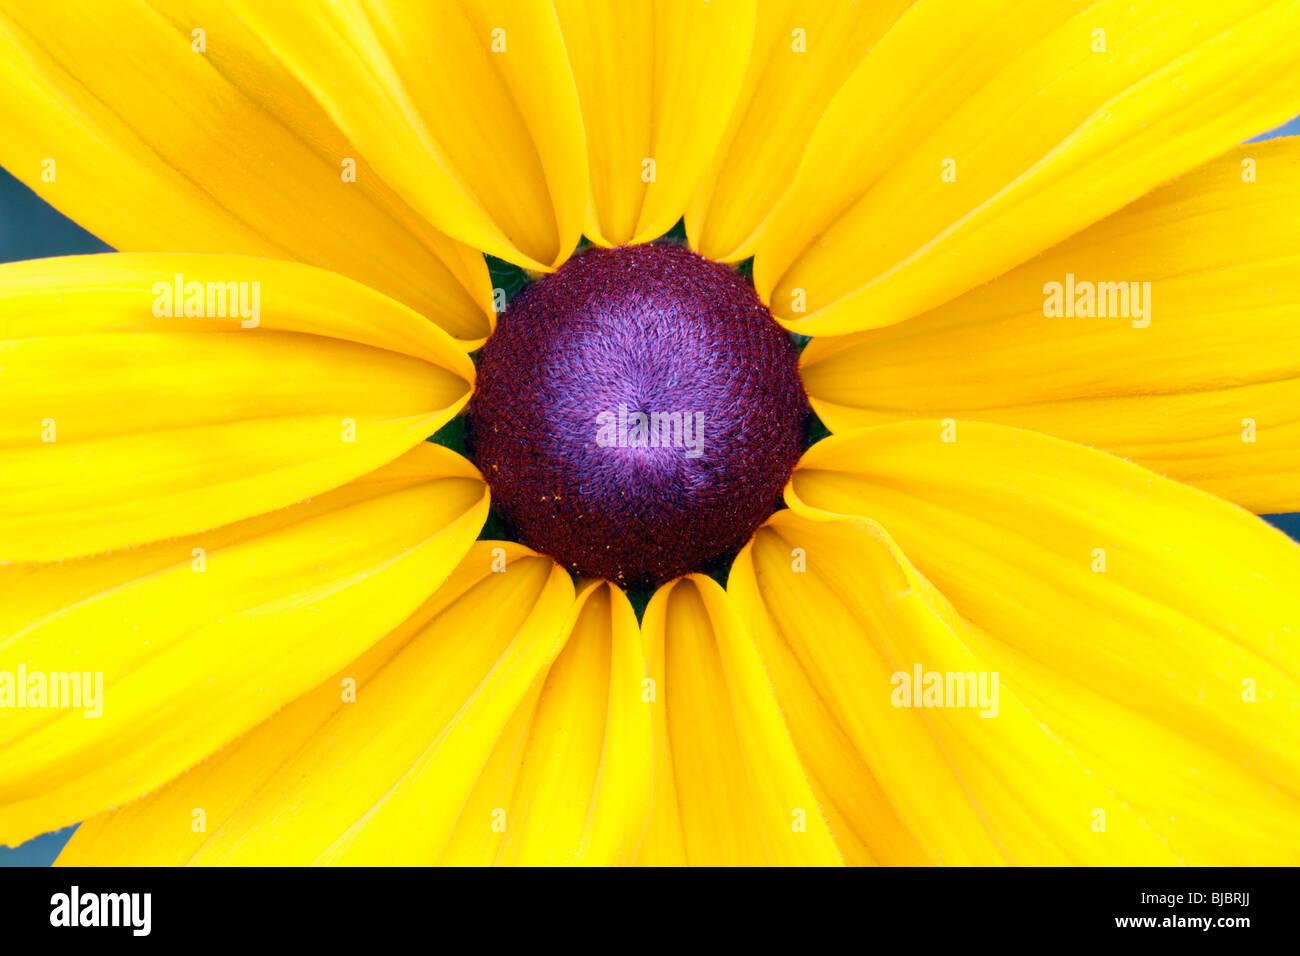 La rudbeckie hérissée (Rudbeckia hirta) - étude détaillée du capitule. Photo Stock